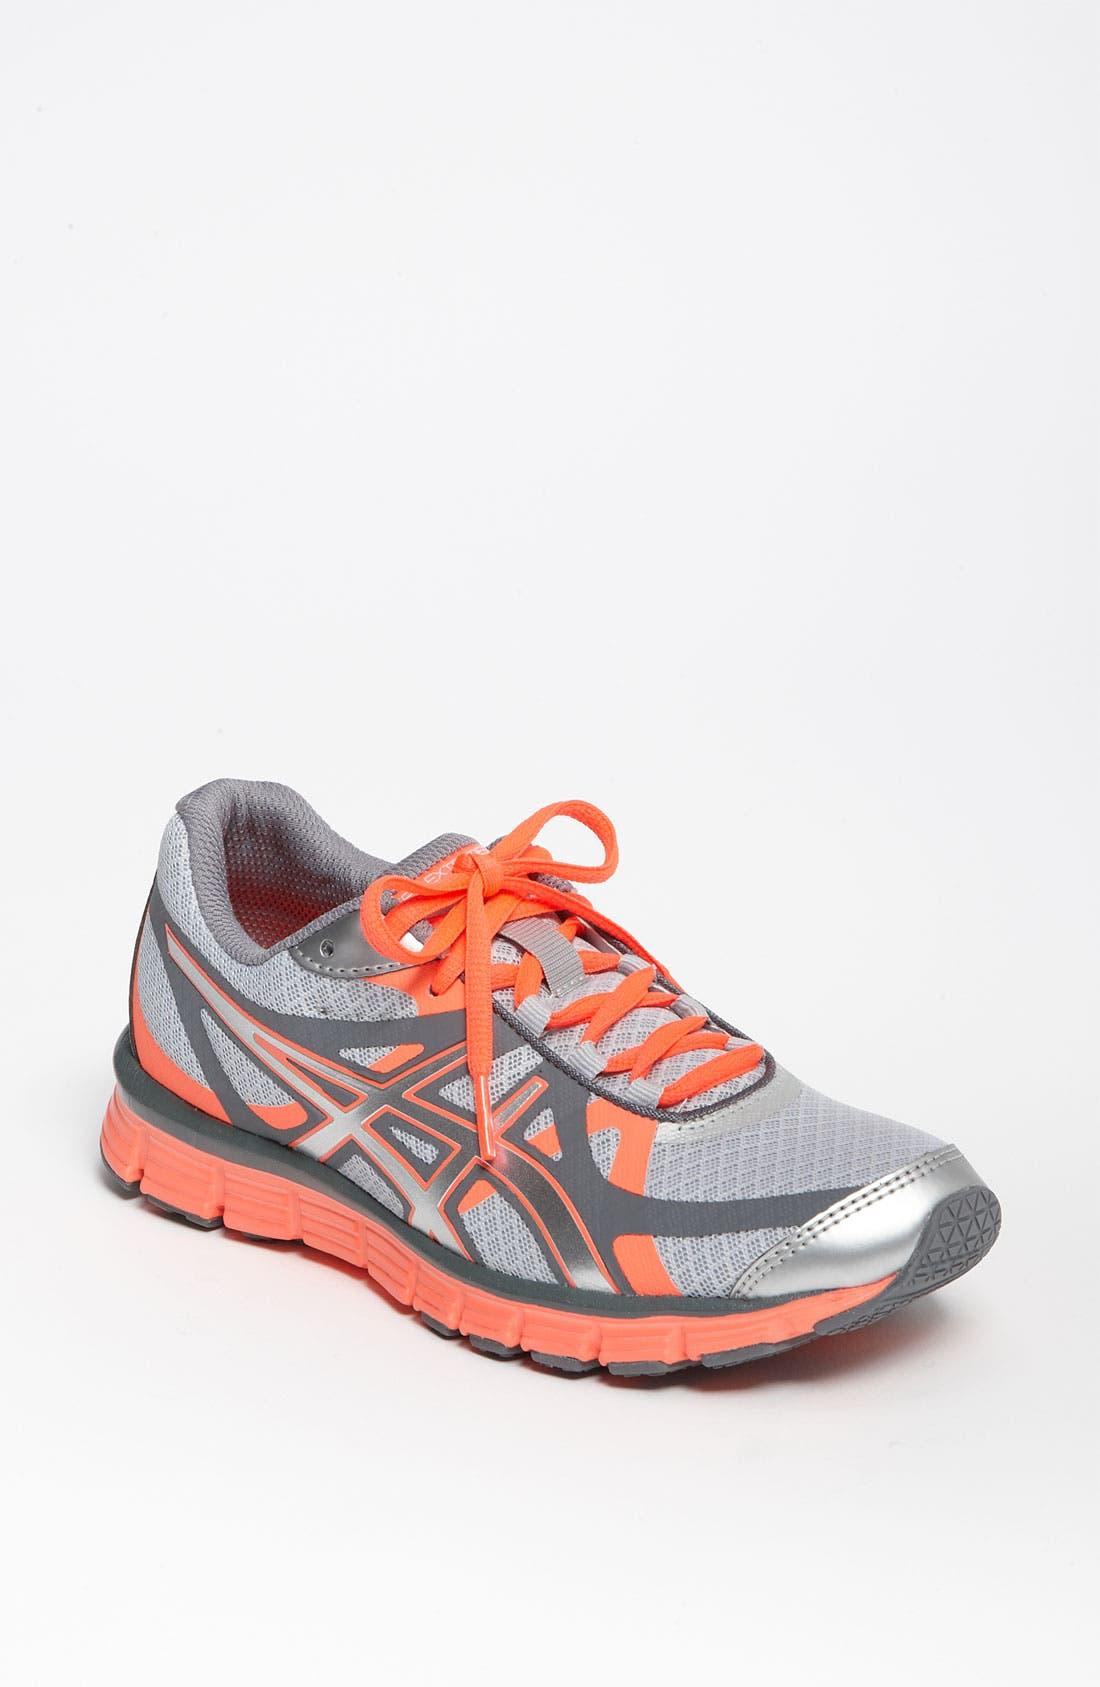 Alternate Image 1 Selected - ASICS® 'Gel Extreme 33' Running Shoe (Women)